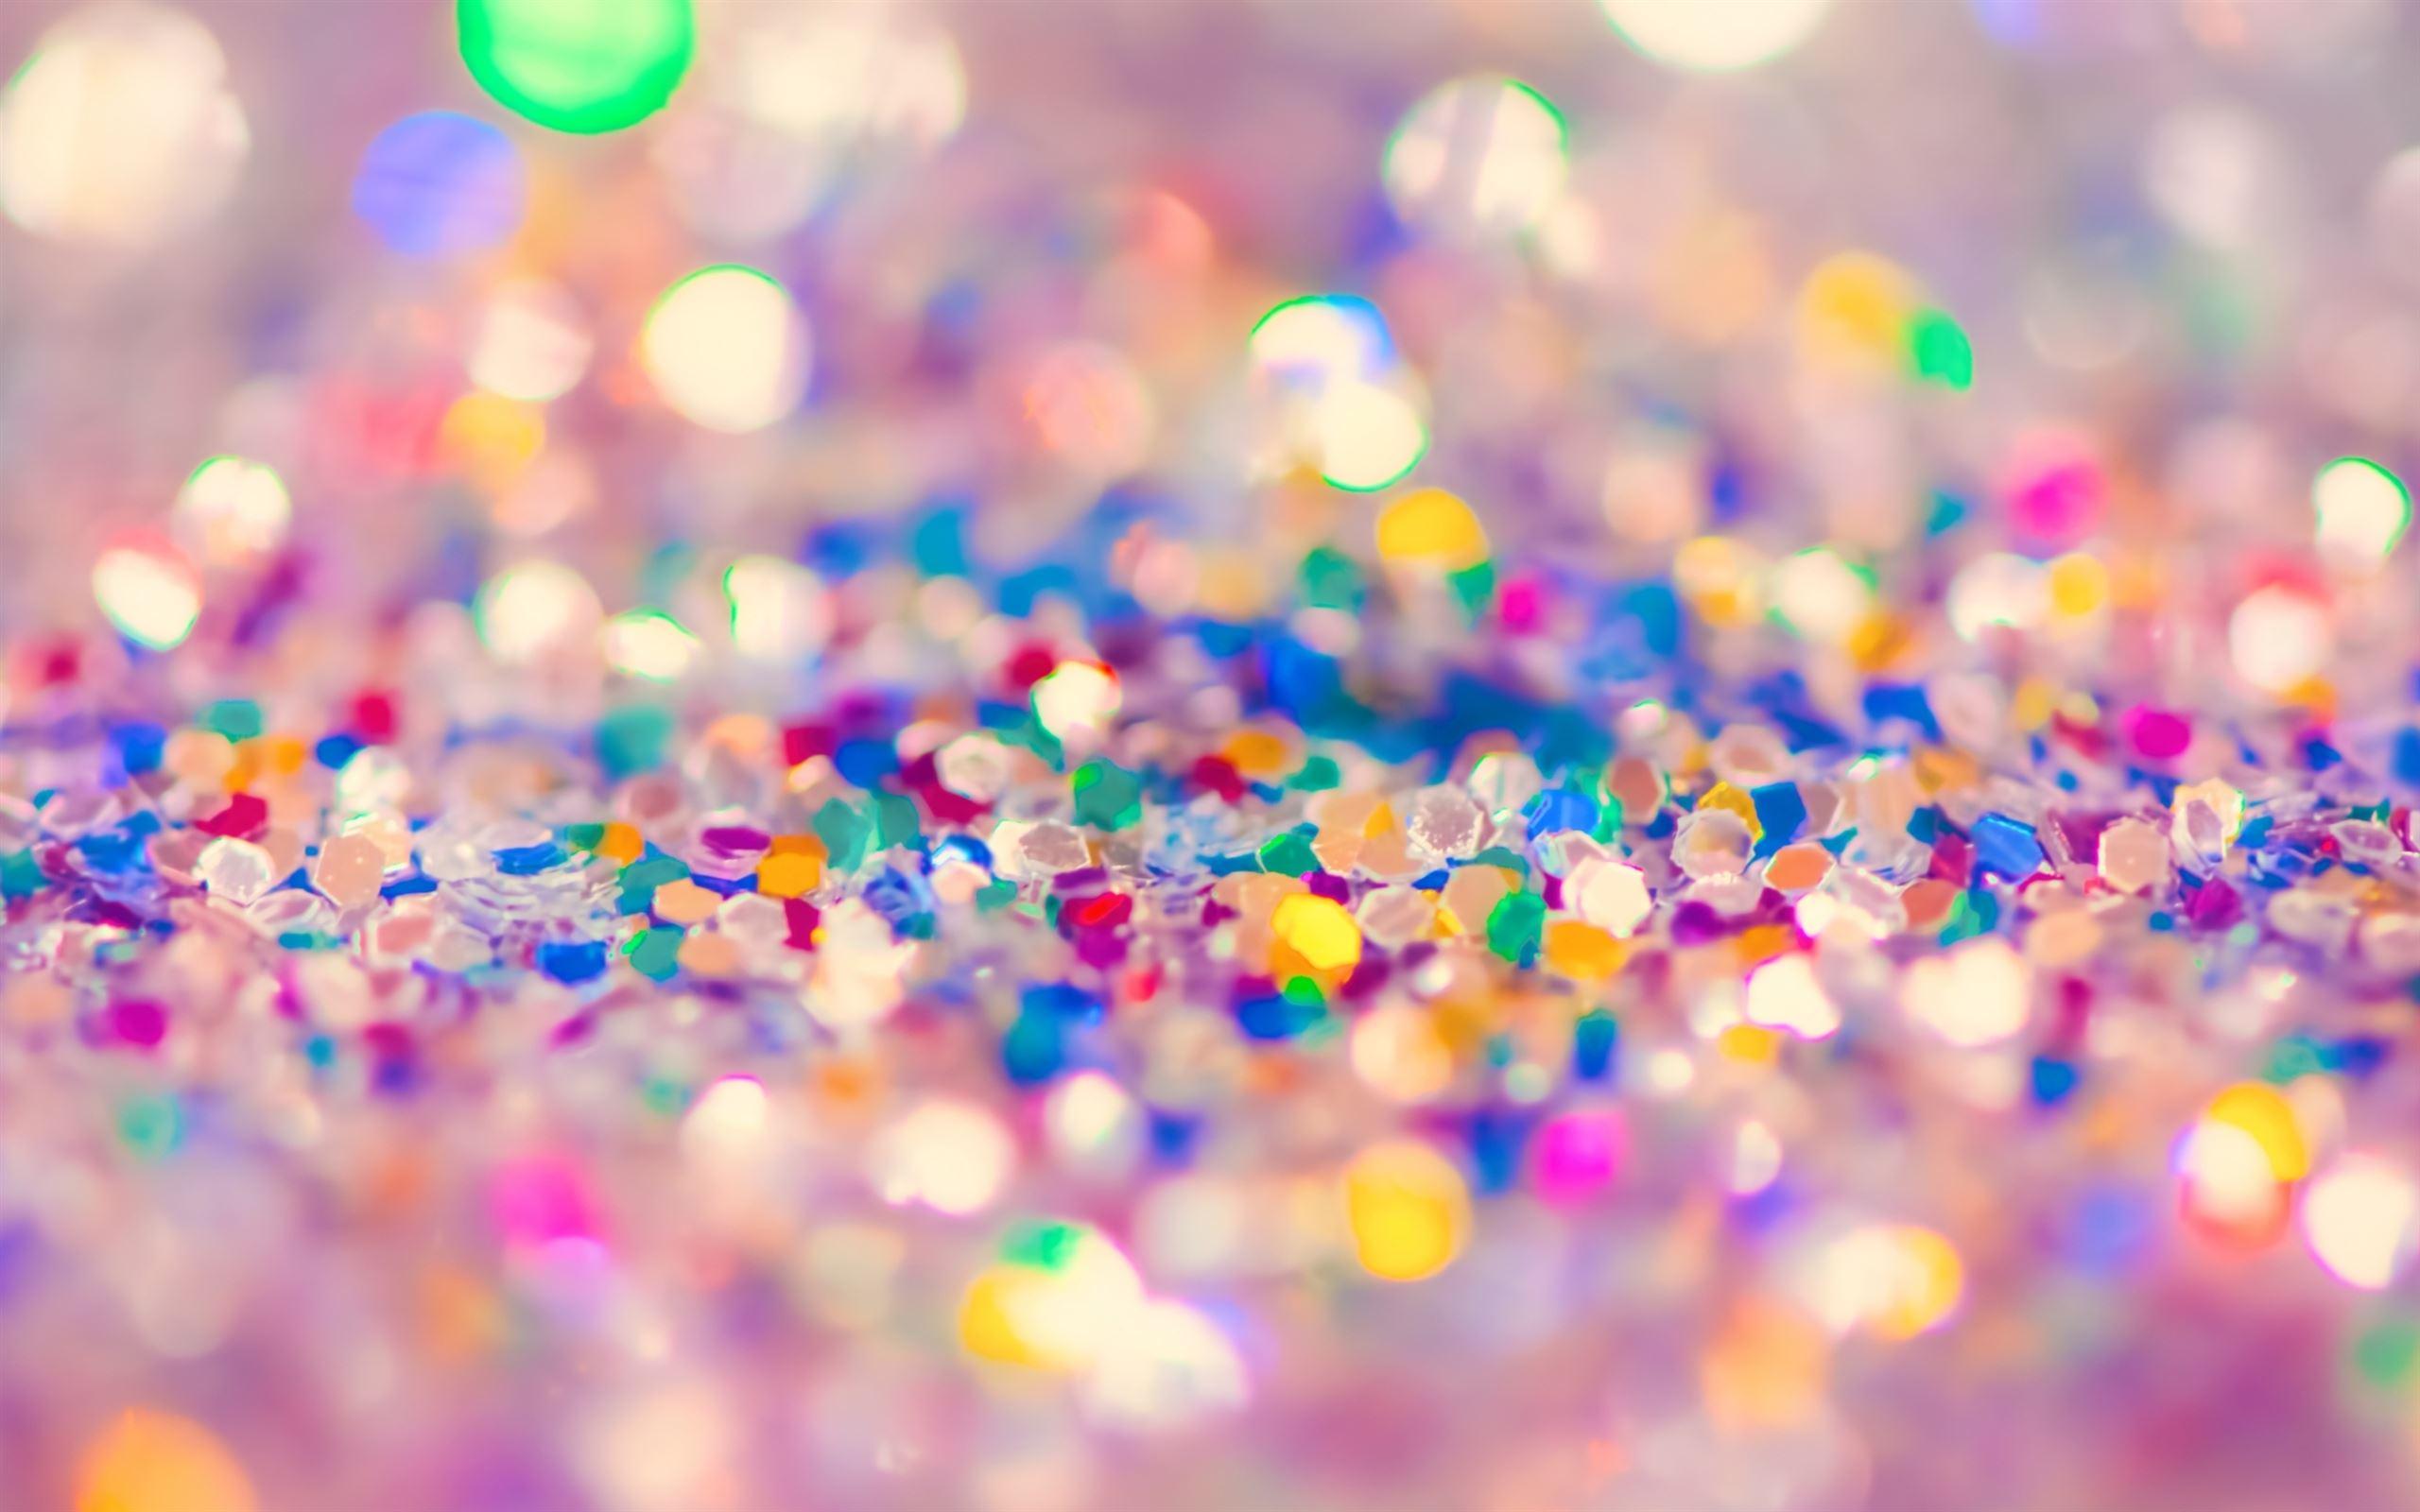 Colorful Glitter Macbook Pro Wallpaper Download Allmacwallpaper